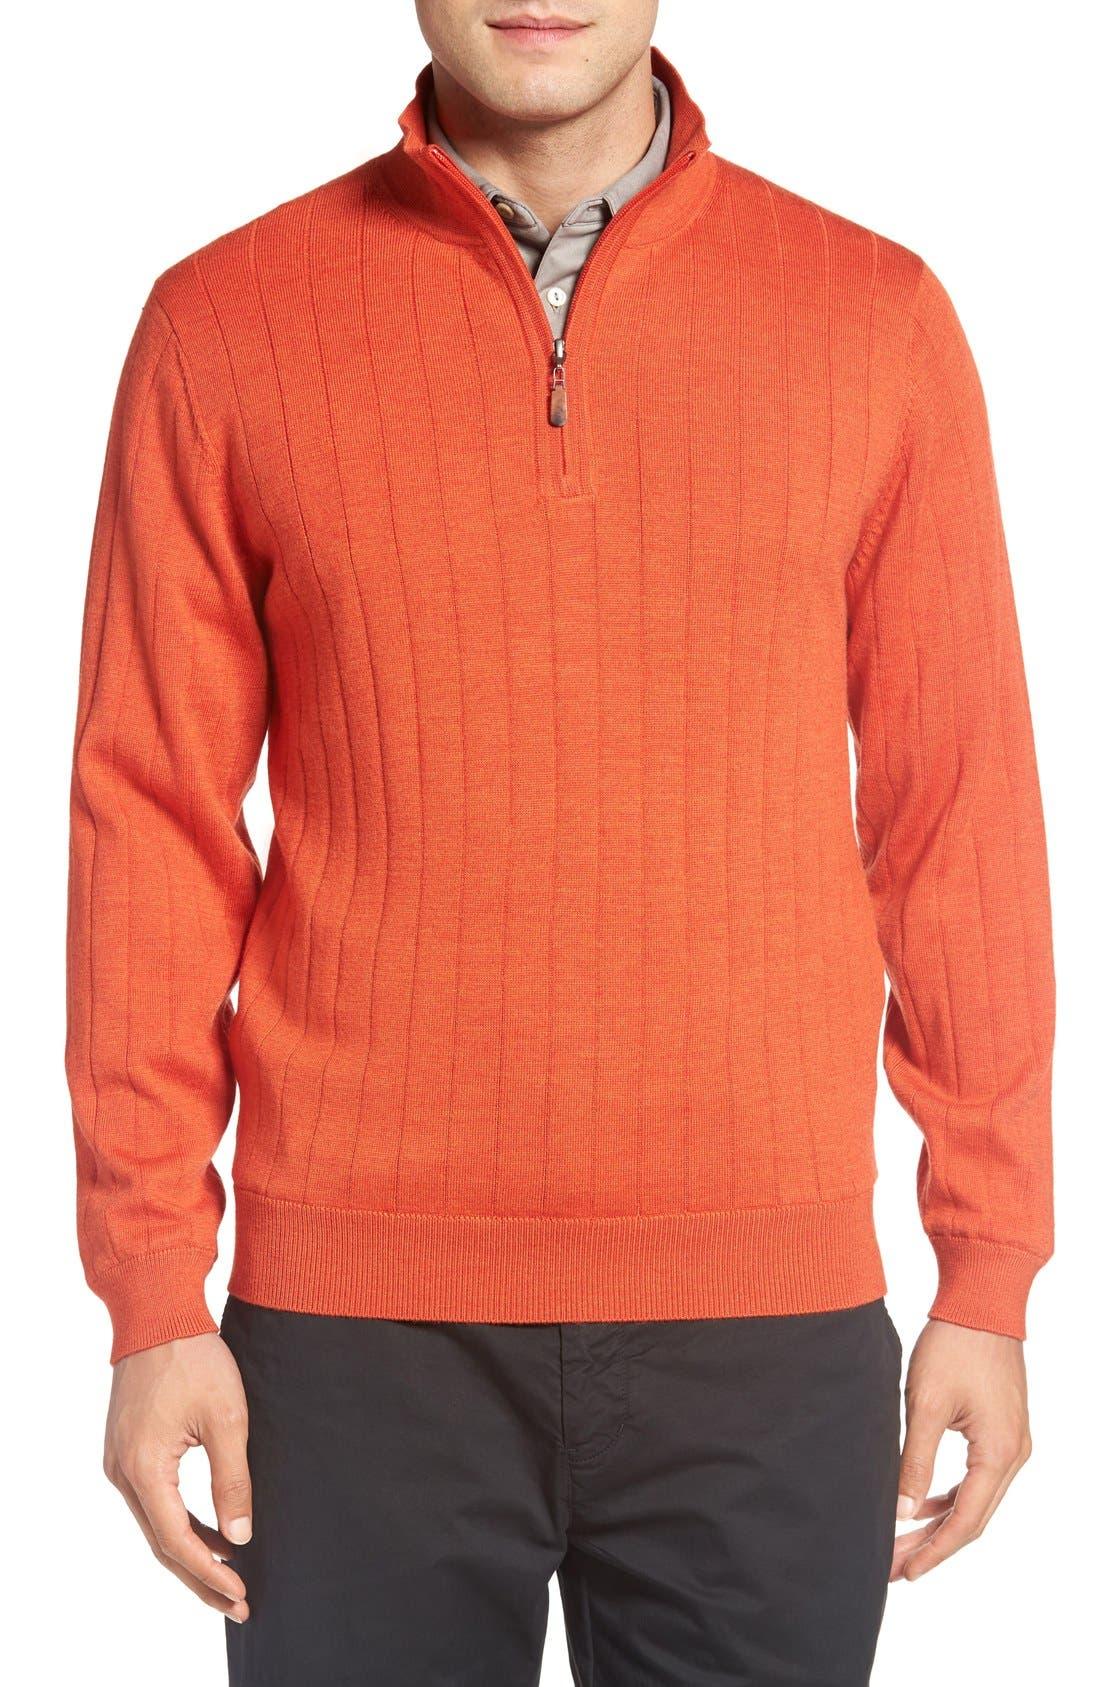 Windproof Merino Wool Quarter Zip Sweater,                         Main,                         color, Orange Tango